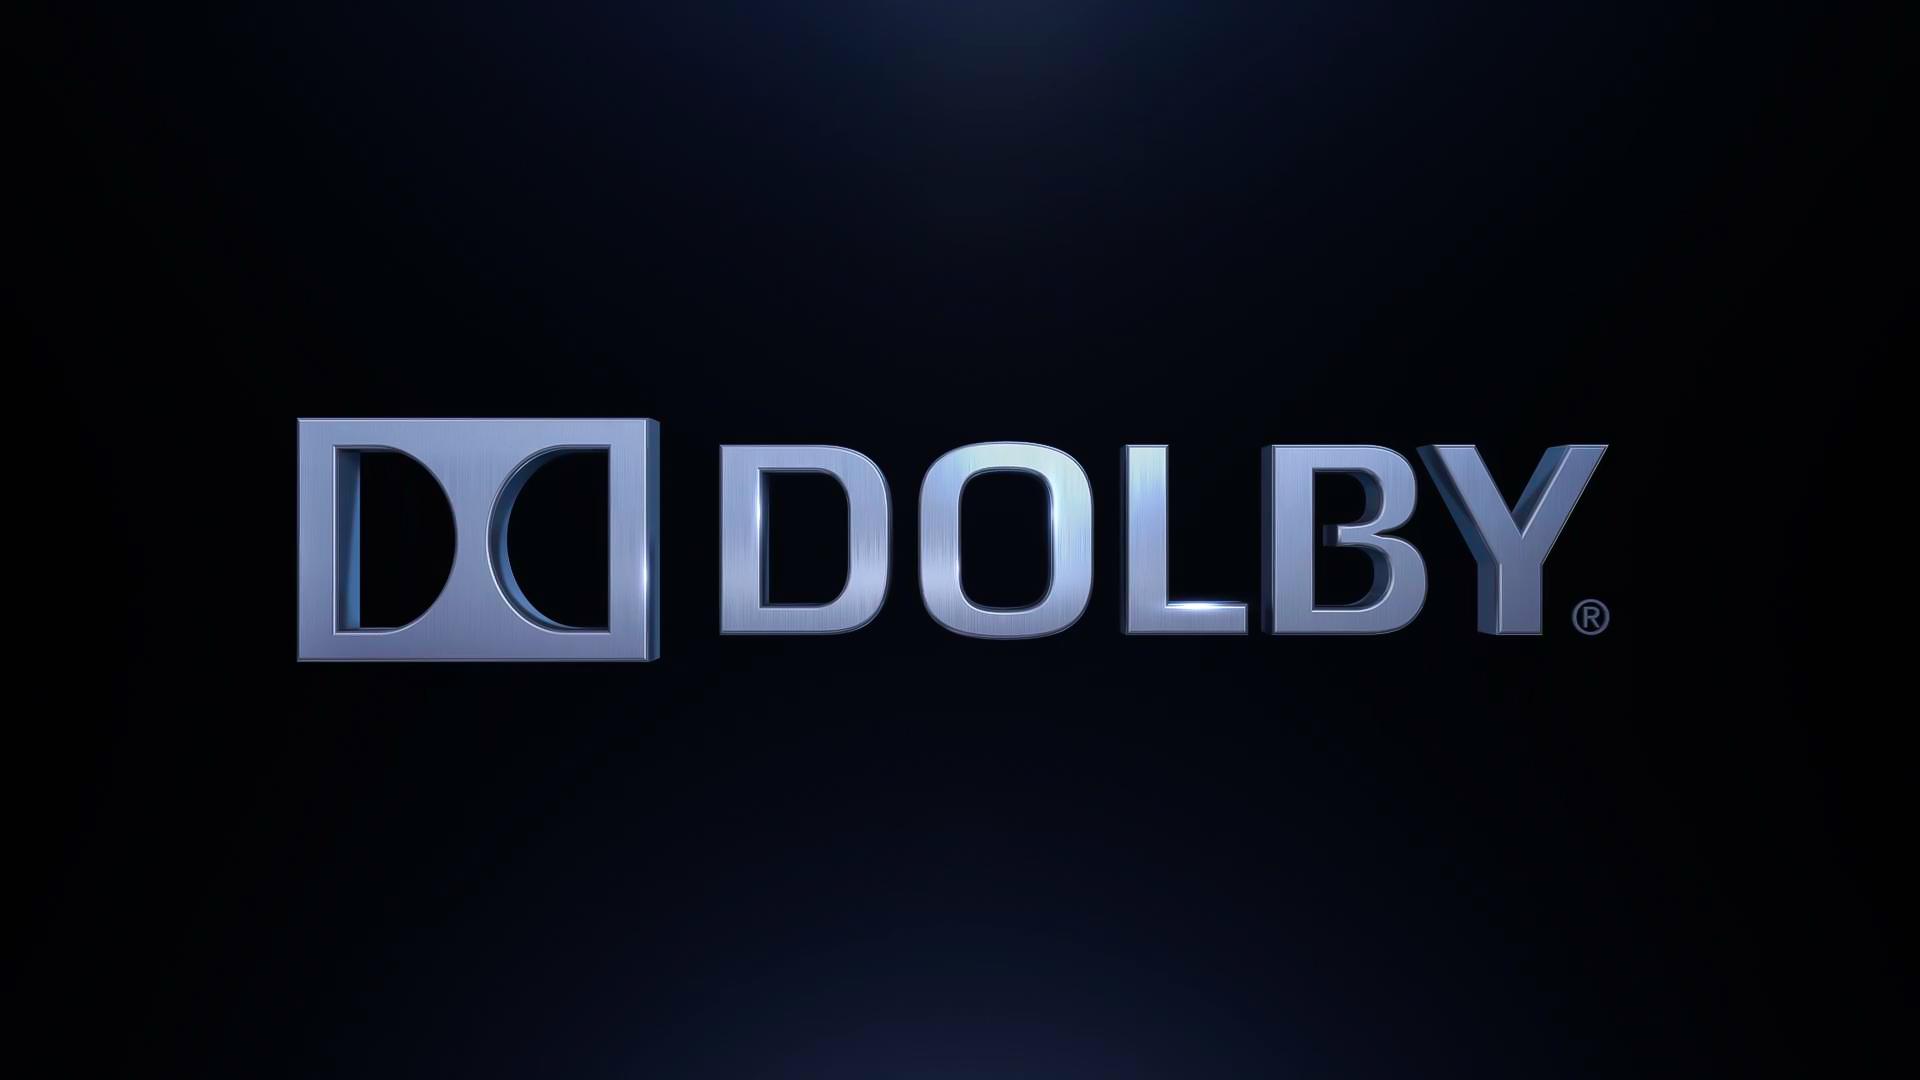 Dolby.mp4_006.jpg